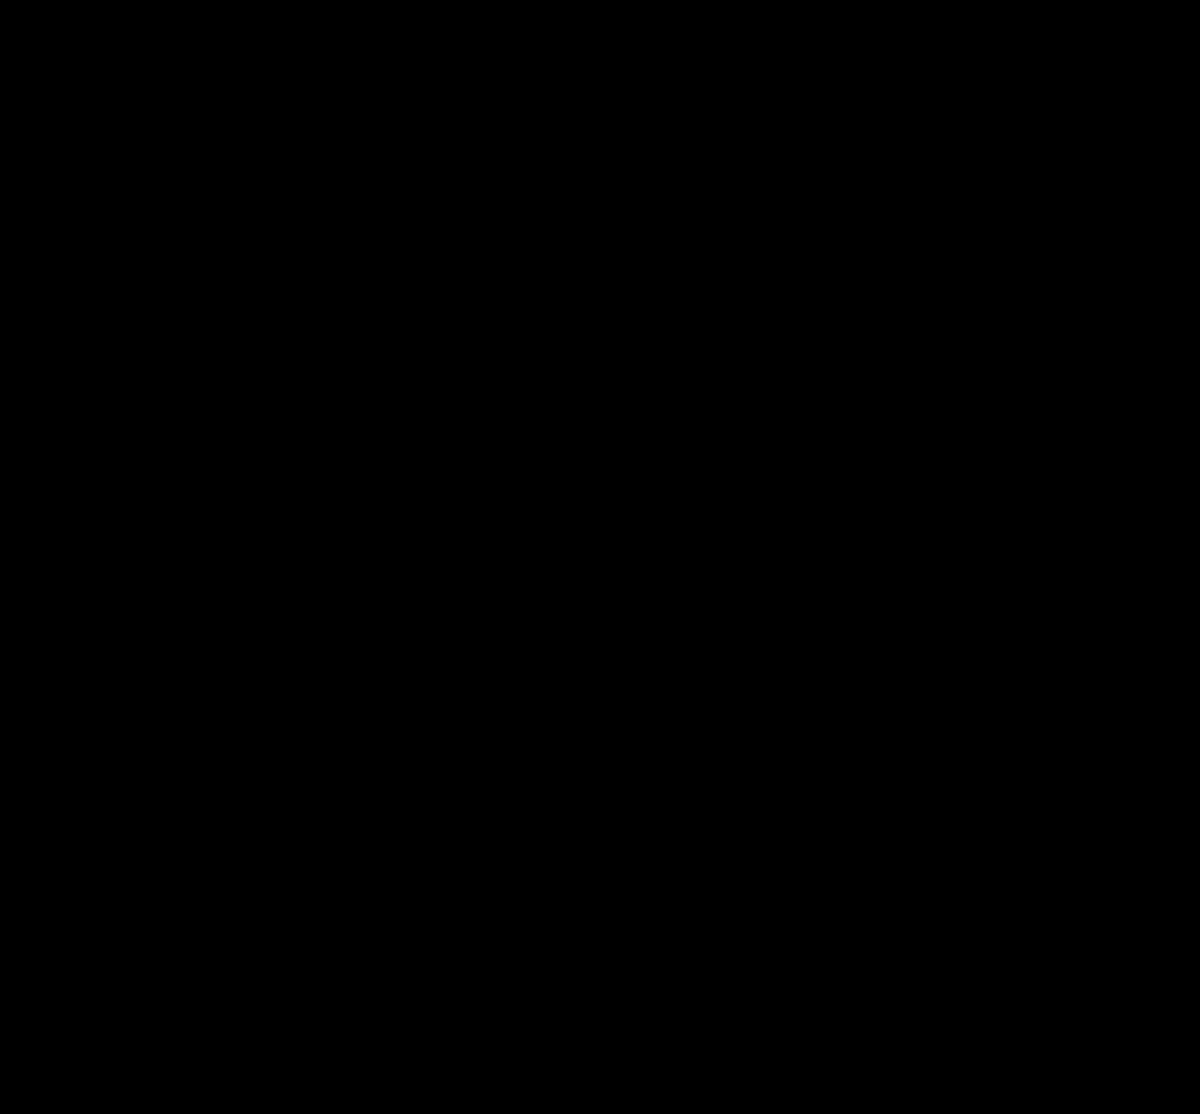 The molecular formula of nicotinamide riboside aka Niagen.